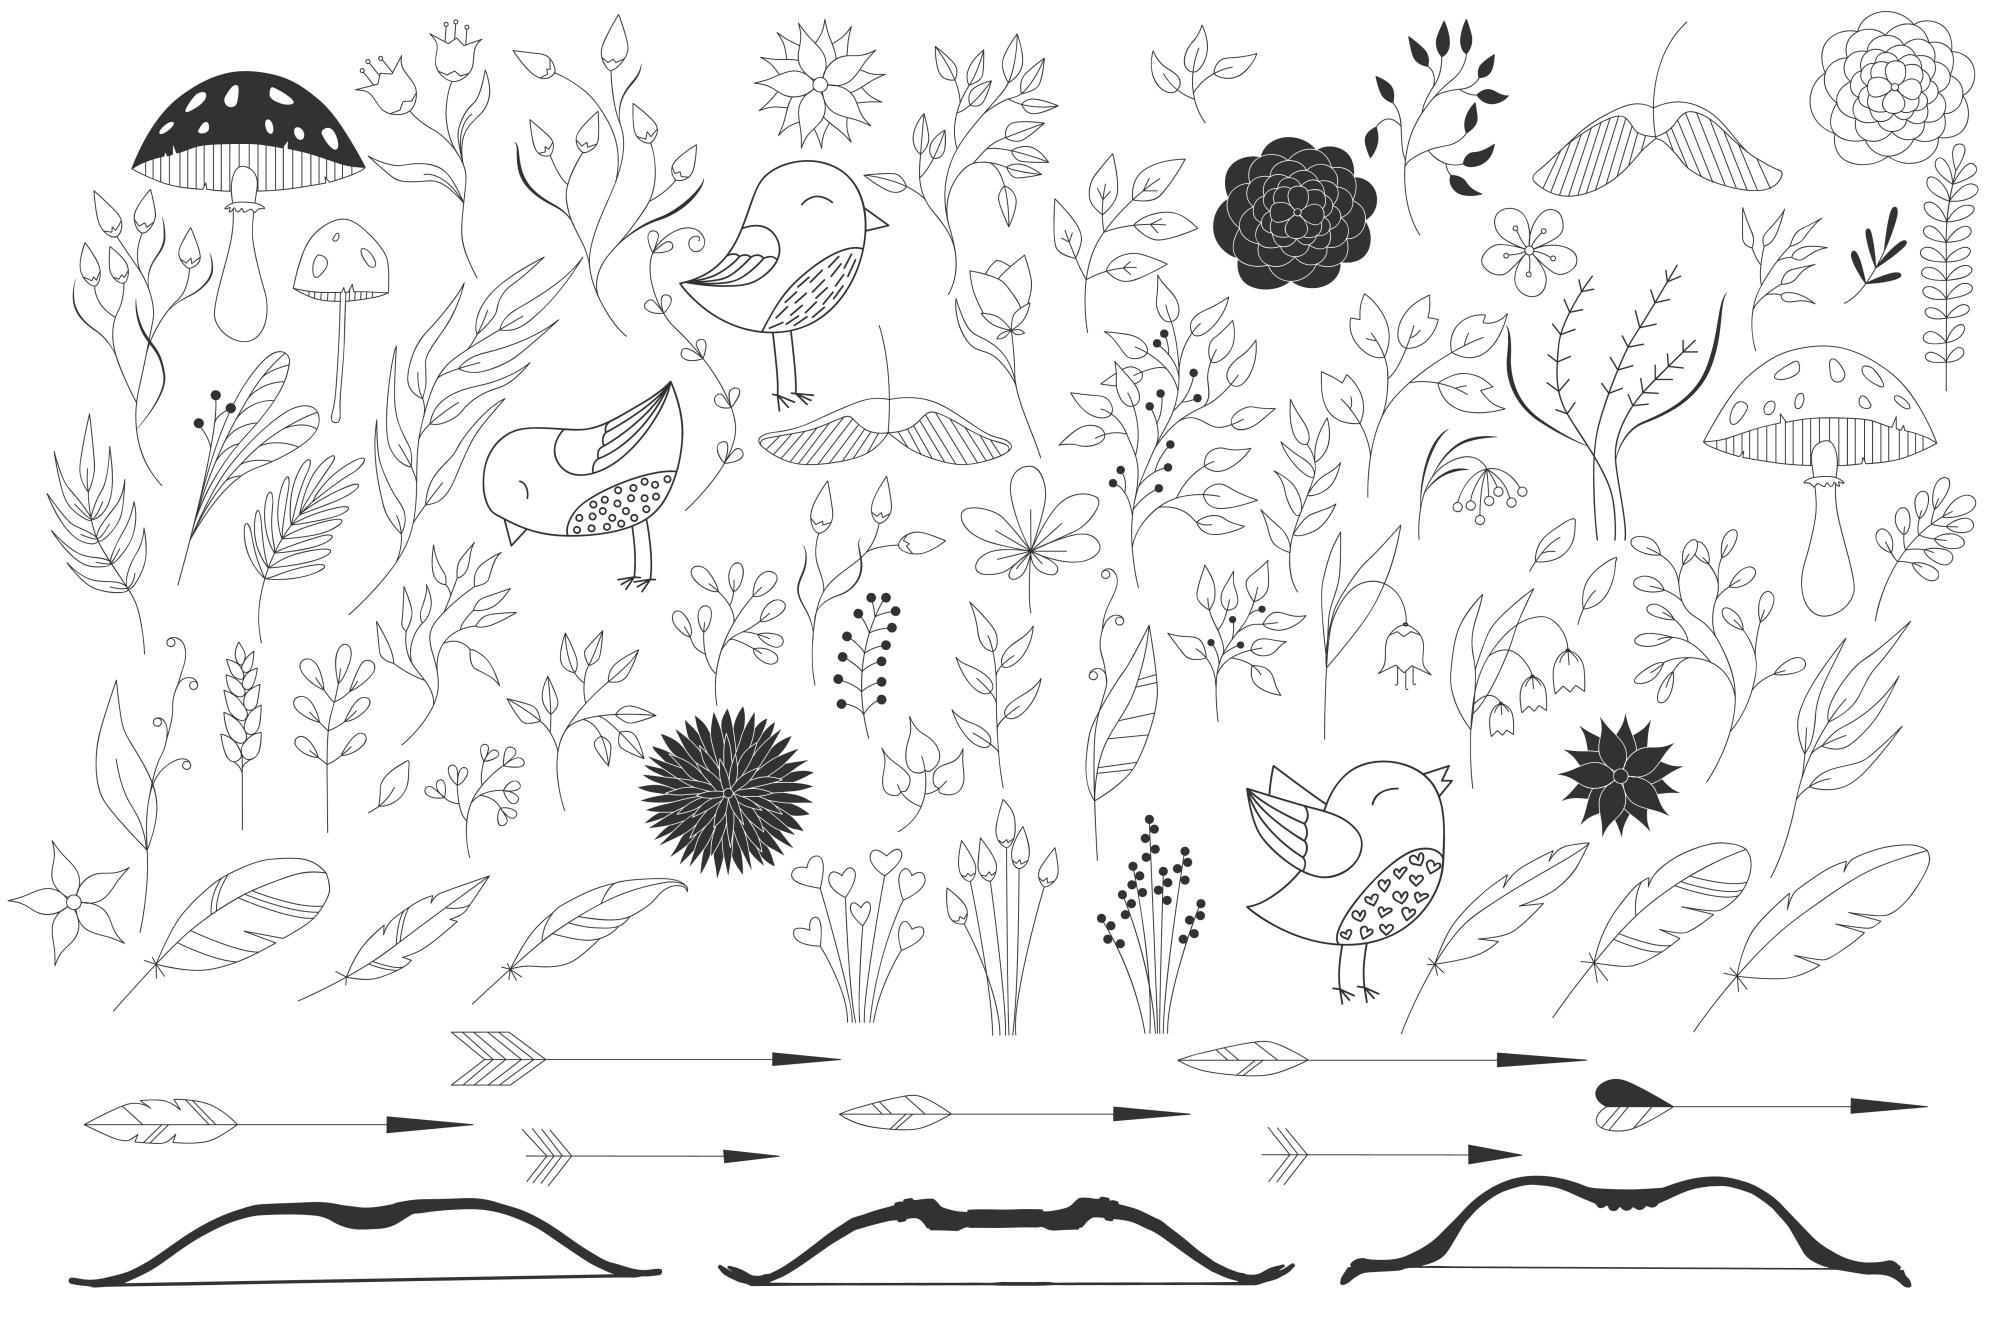 450 handsketched elements. Nature mega pack example image 20